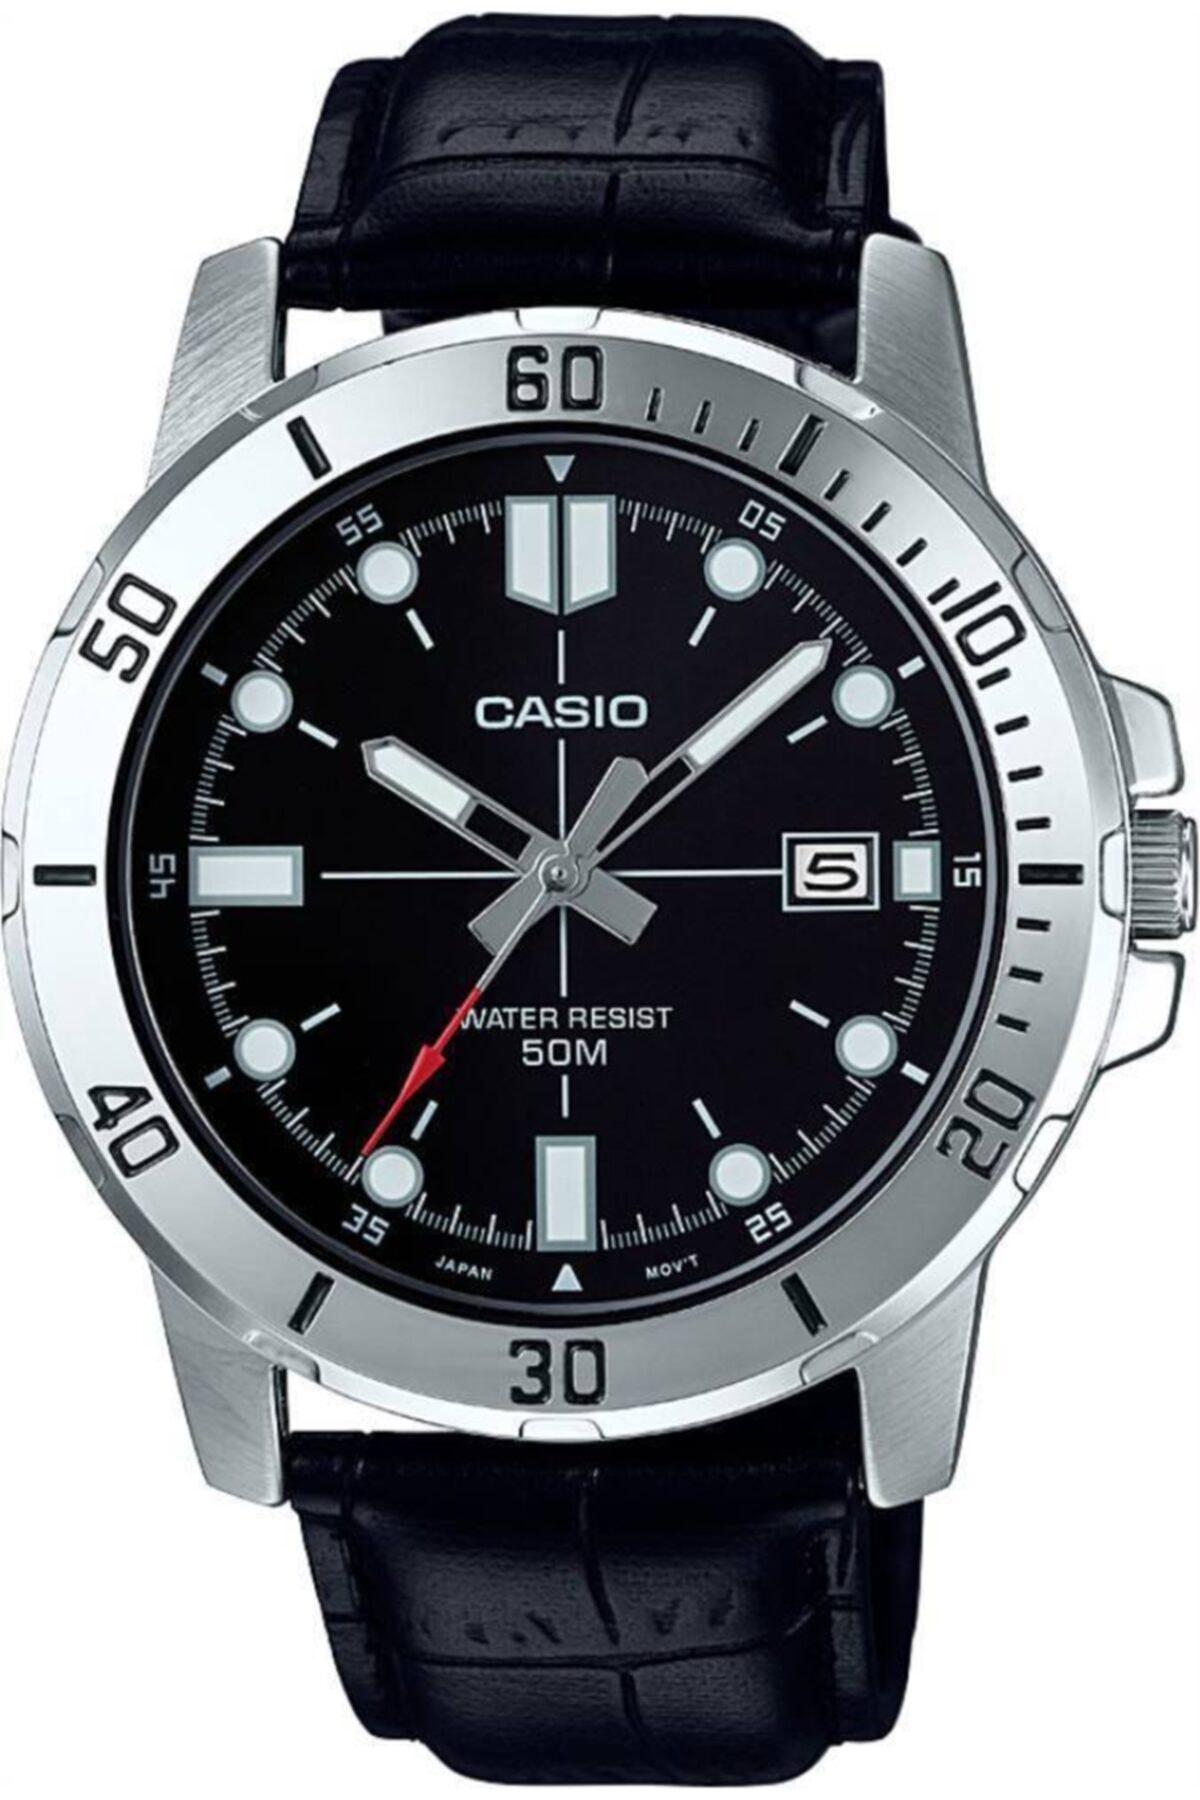 Casio Erkek Kol Saati Mtp-vd01l-1evudf 1